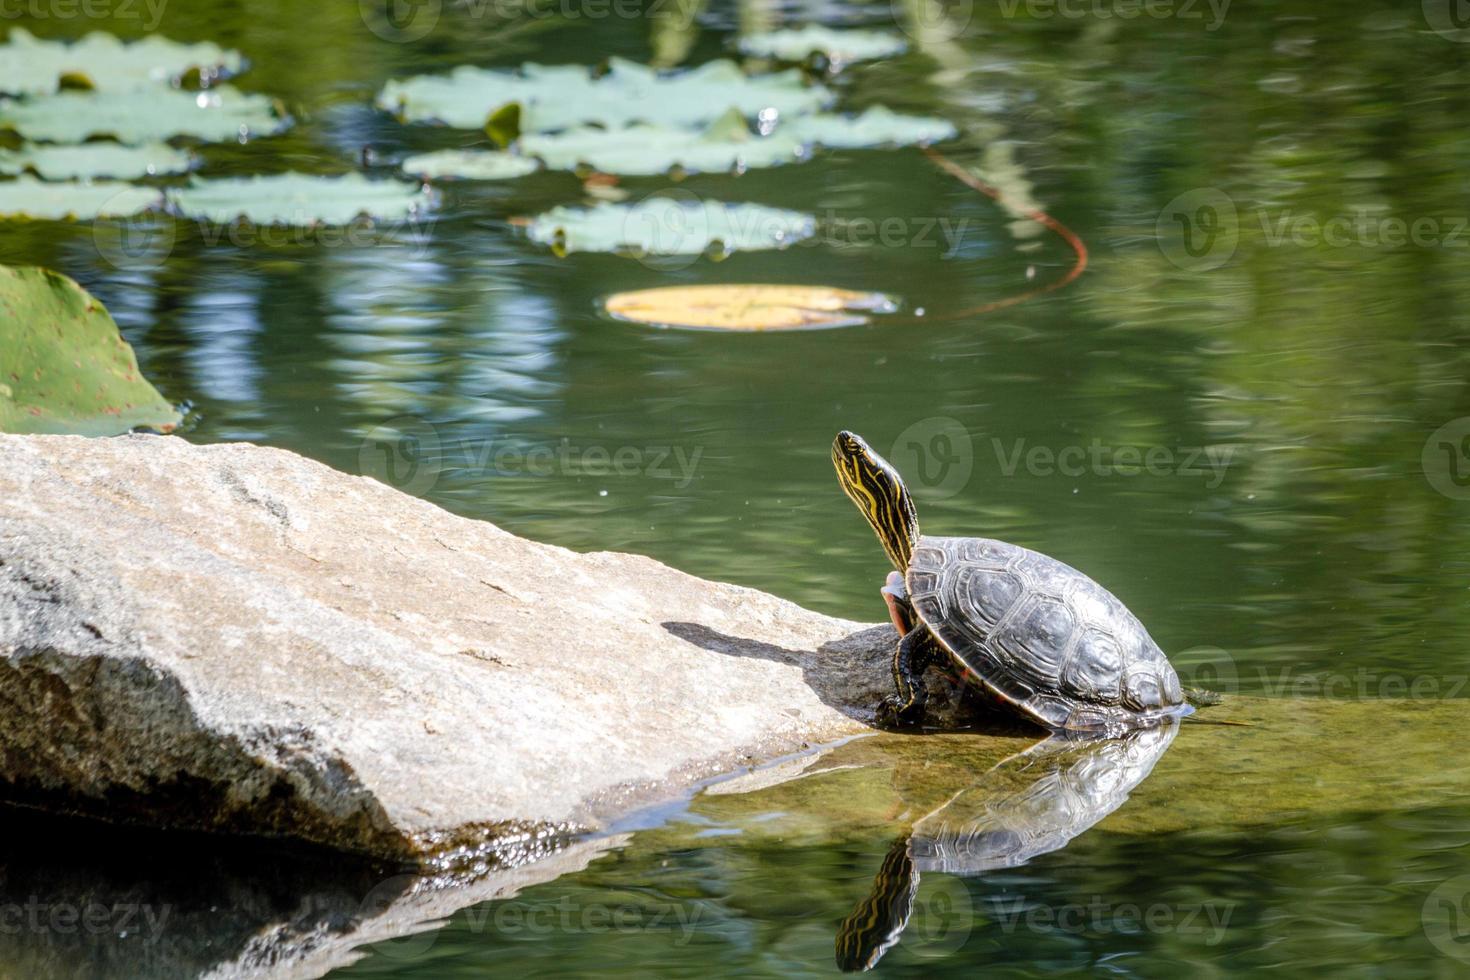 tortuga pintada occidental en estanque foto